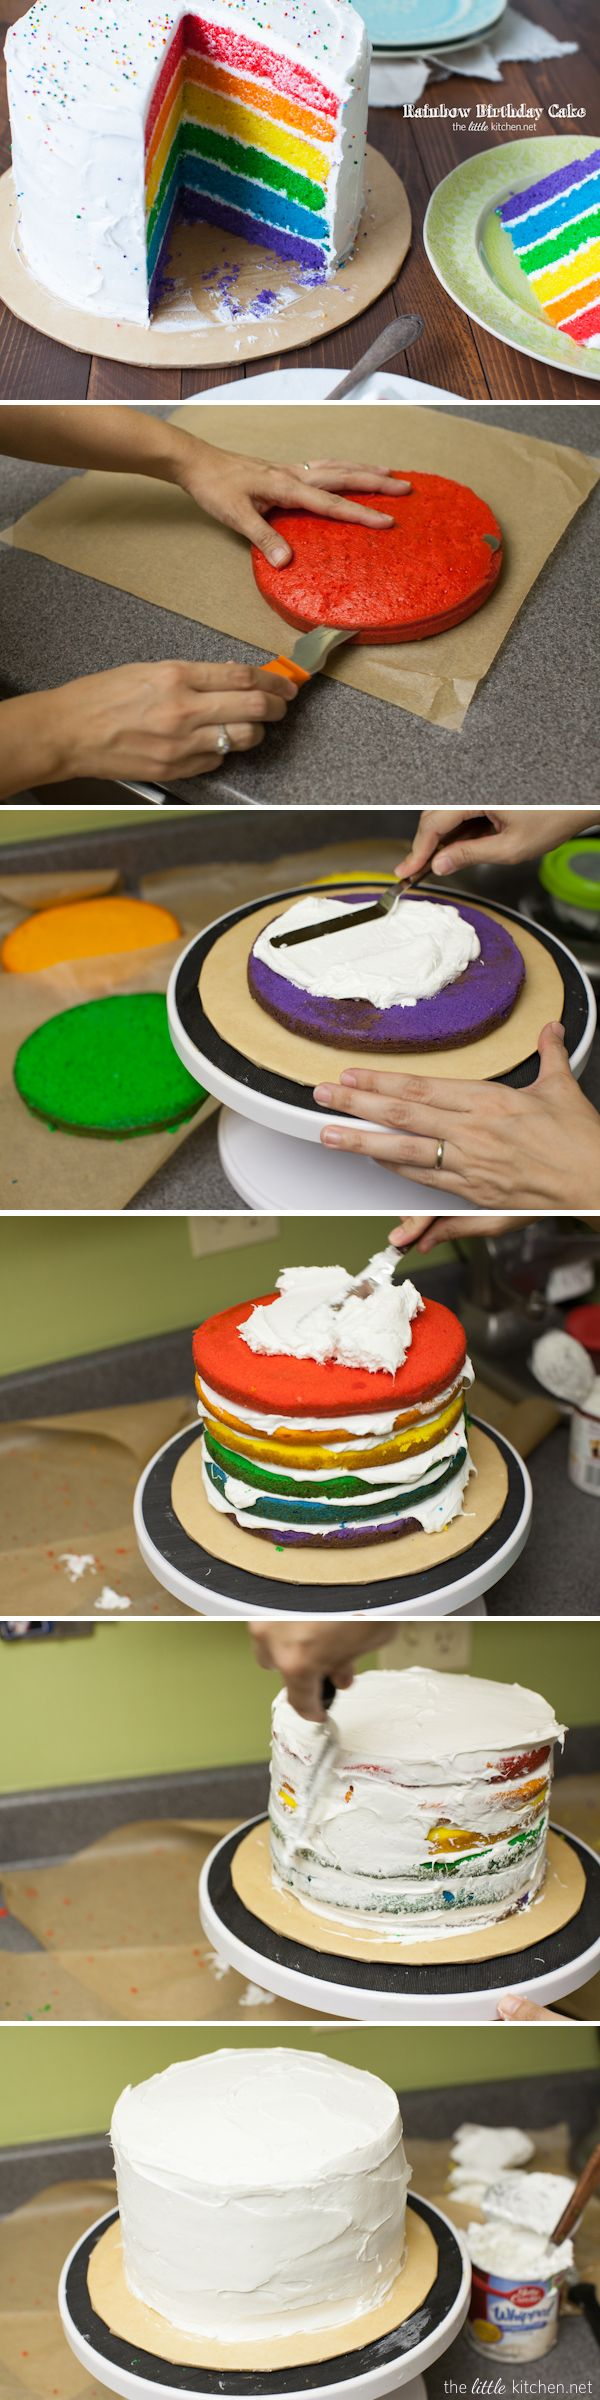 Rainbow Birthday Cake from thelittlekitchen.net #GetYourBettyOn